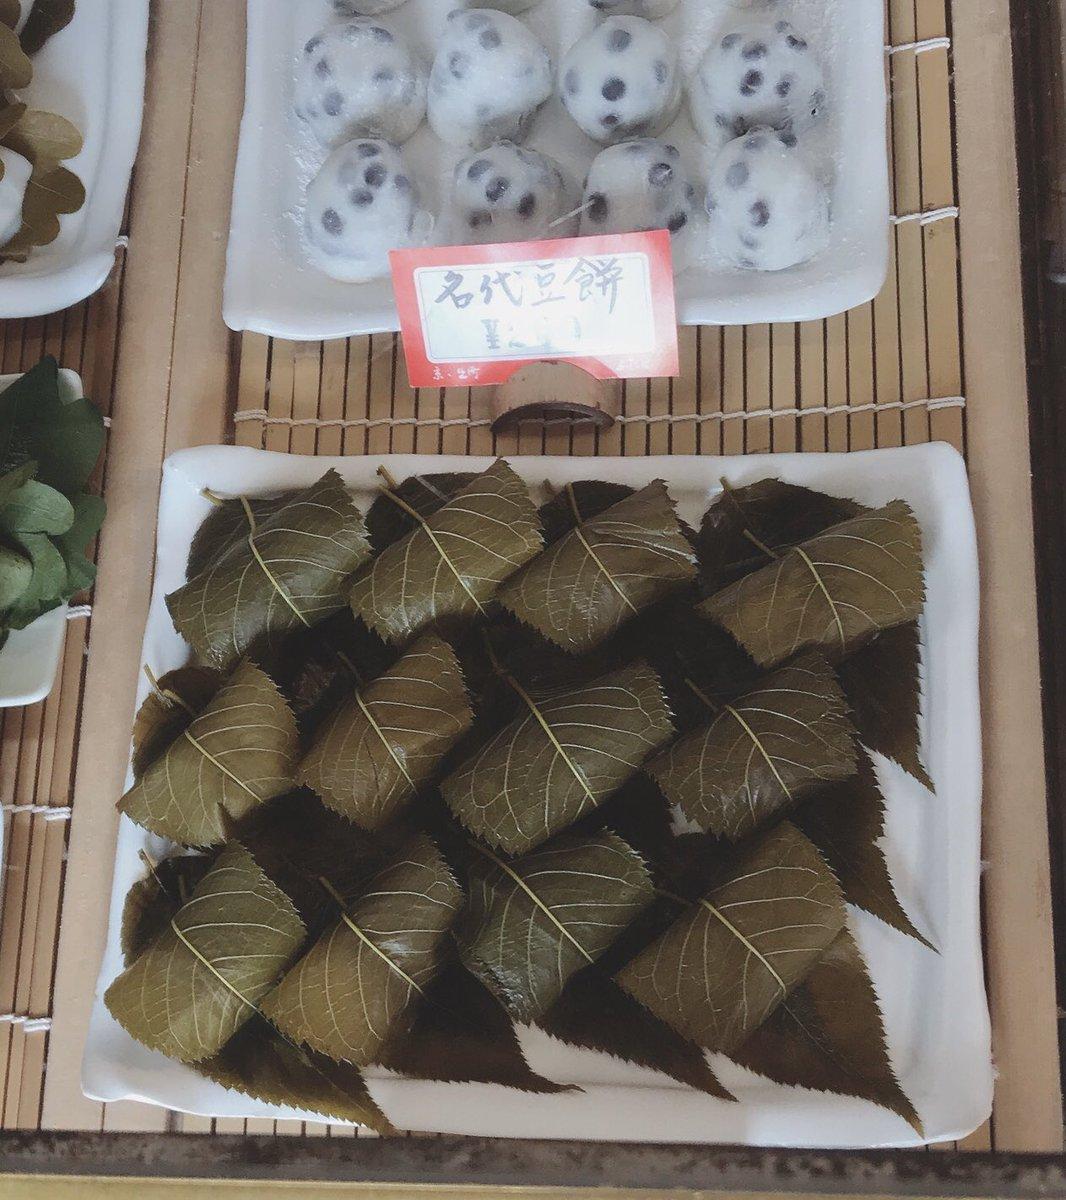 test ツイッターメディア - 出町ふたばで豆餅、桜餅を買いました。 https://t.co/hXjLmpZ8Af